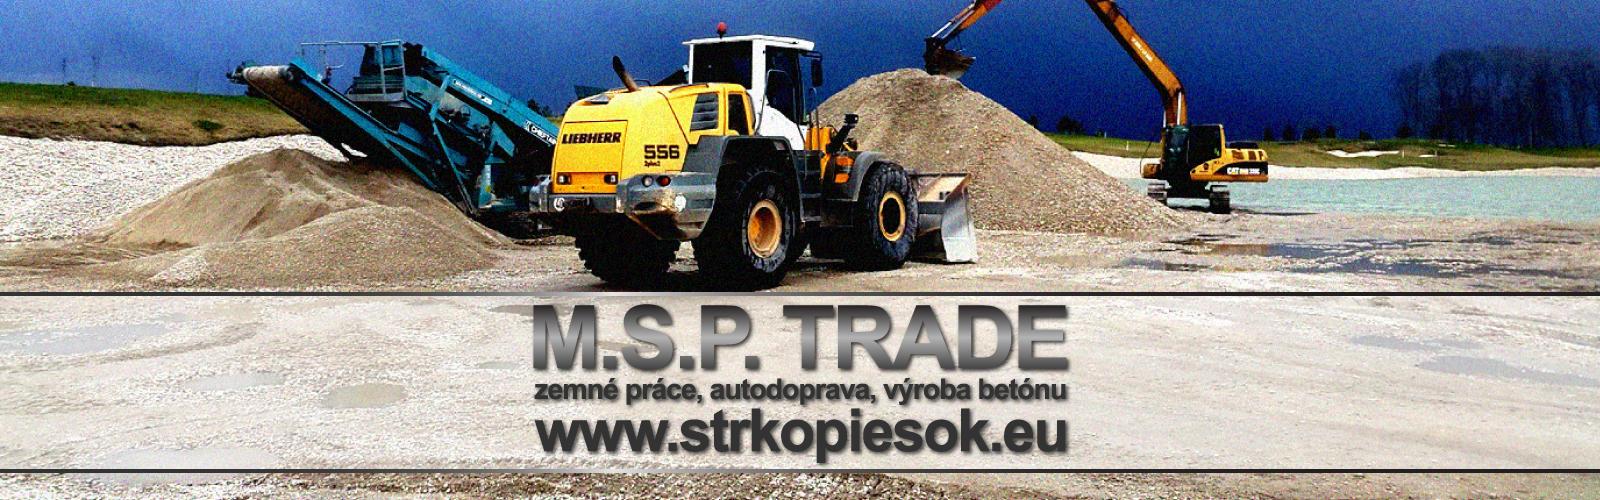 MSP Trade